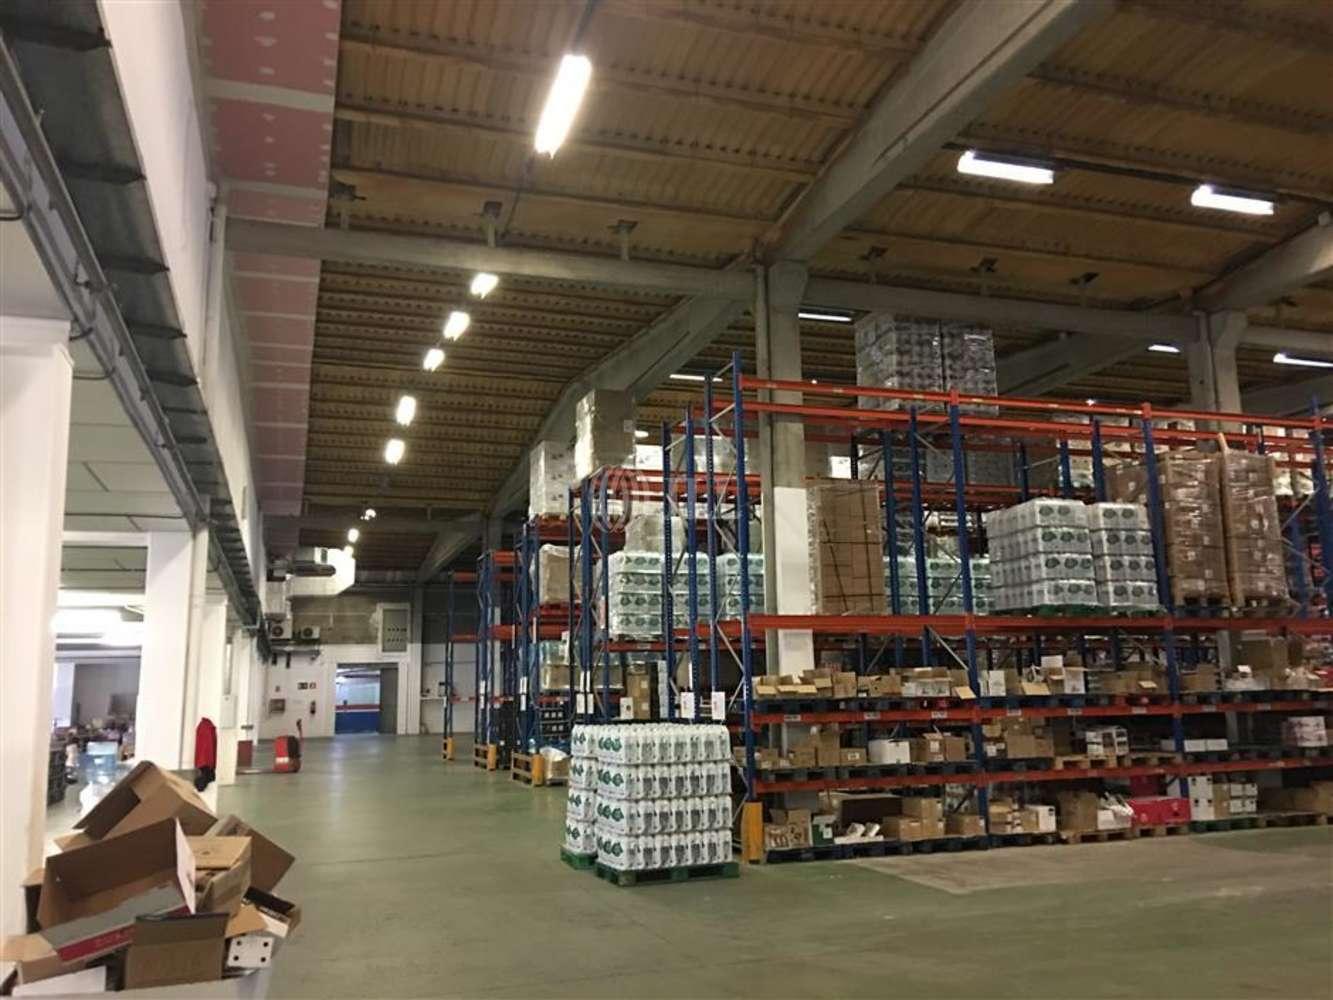 Naves industriales y logísticas Sant fruitós de bages, 08272 - Nave Logistica - B0425 - PI SANT ISIDRE - 8723